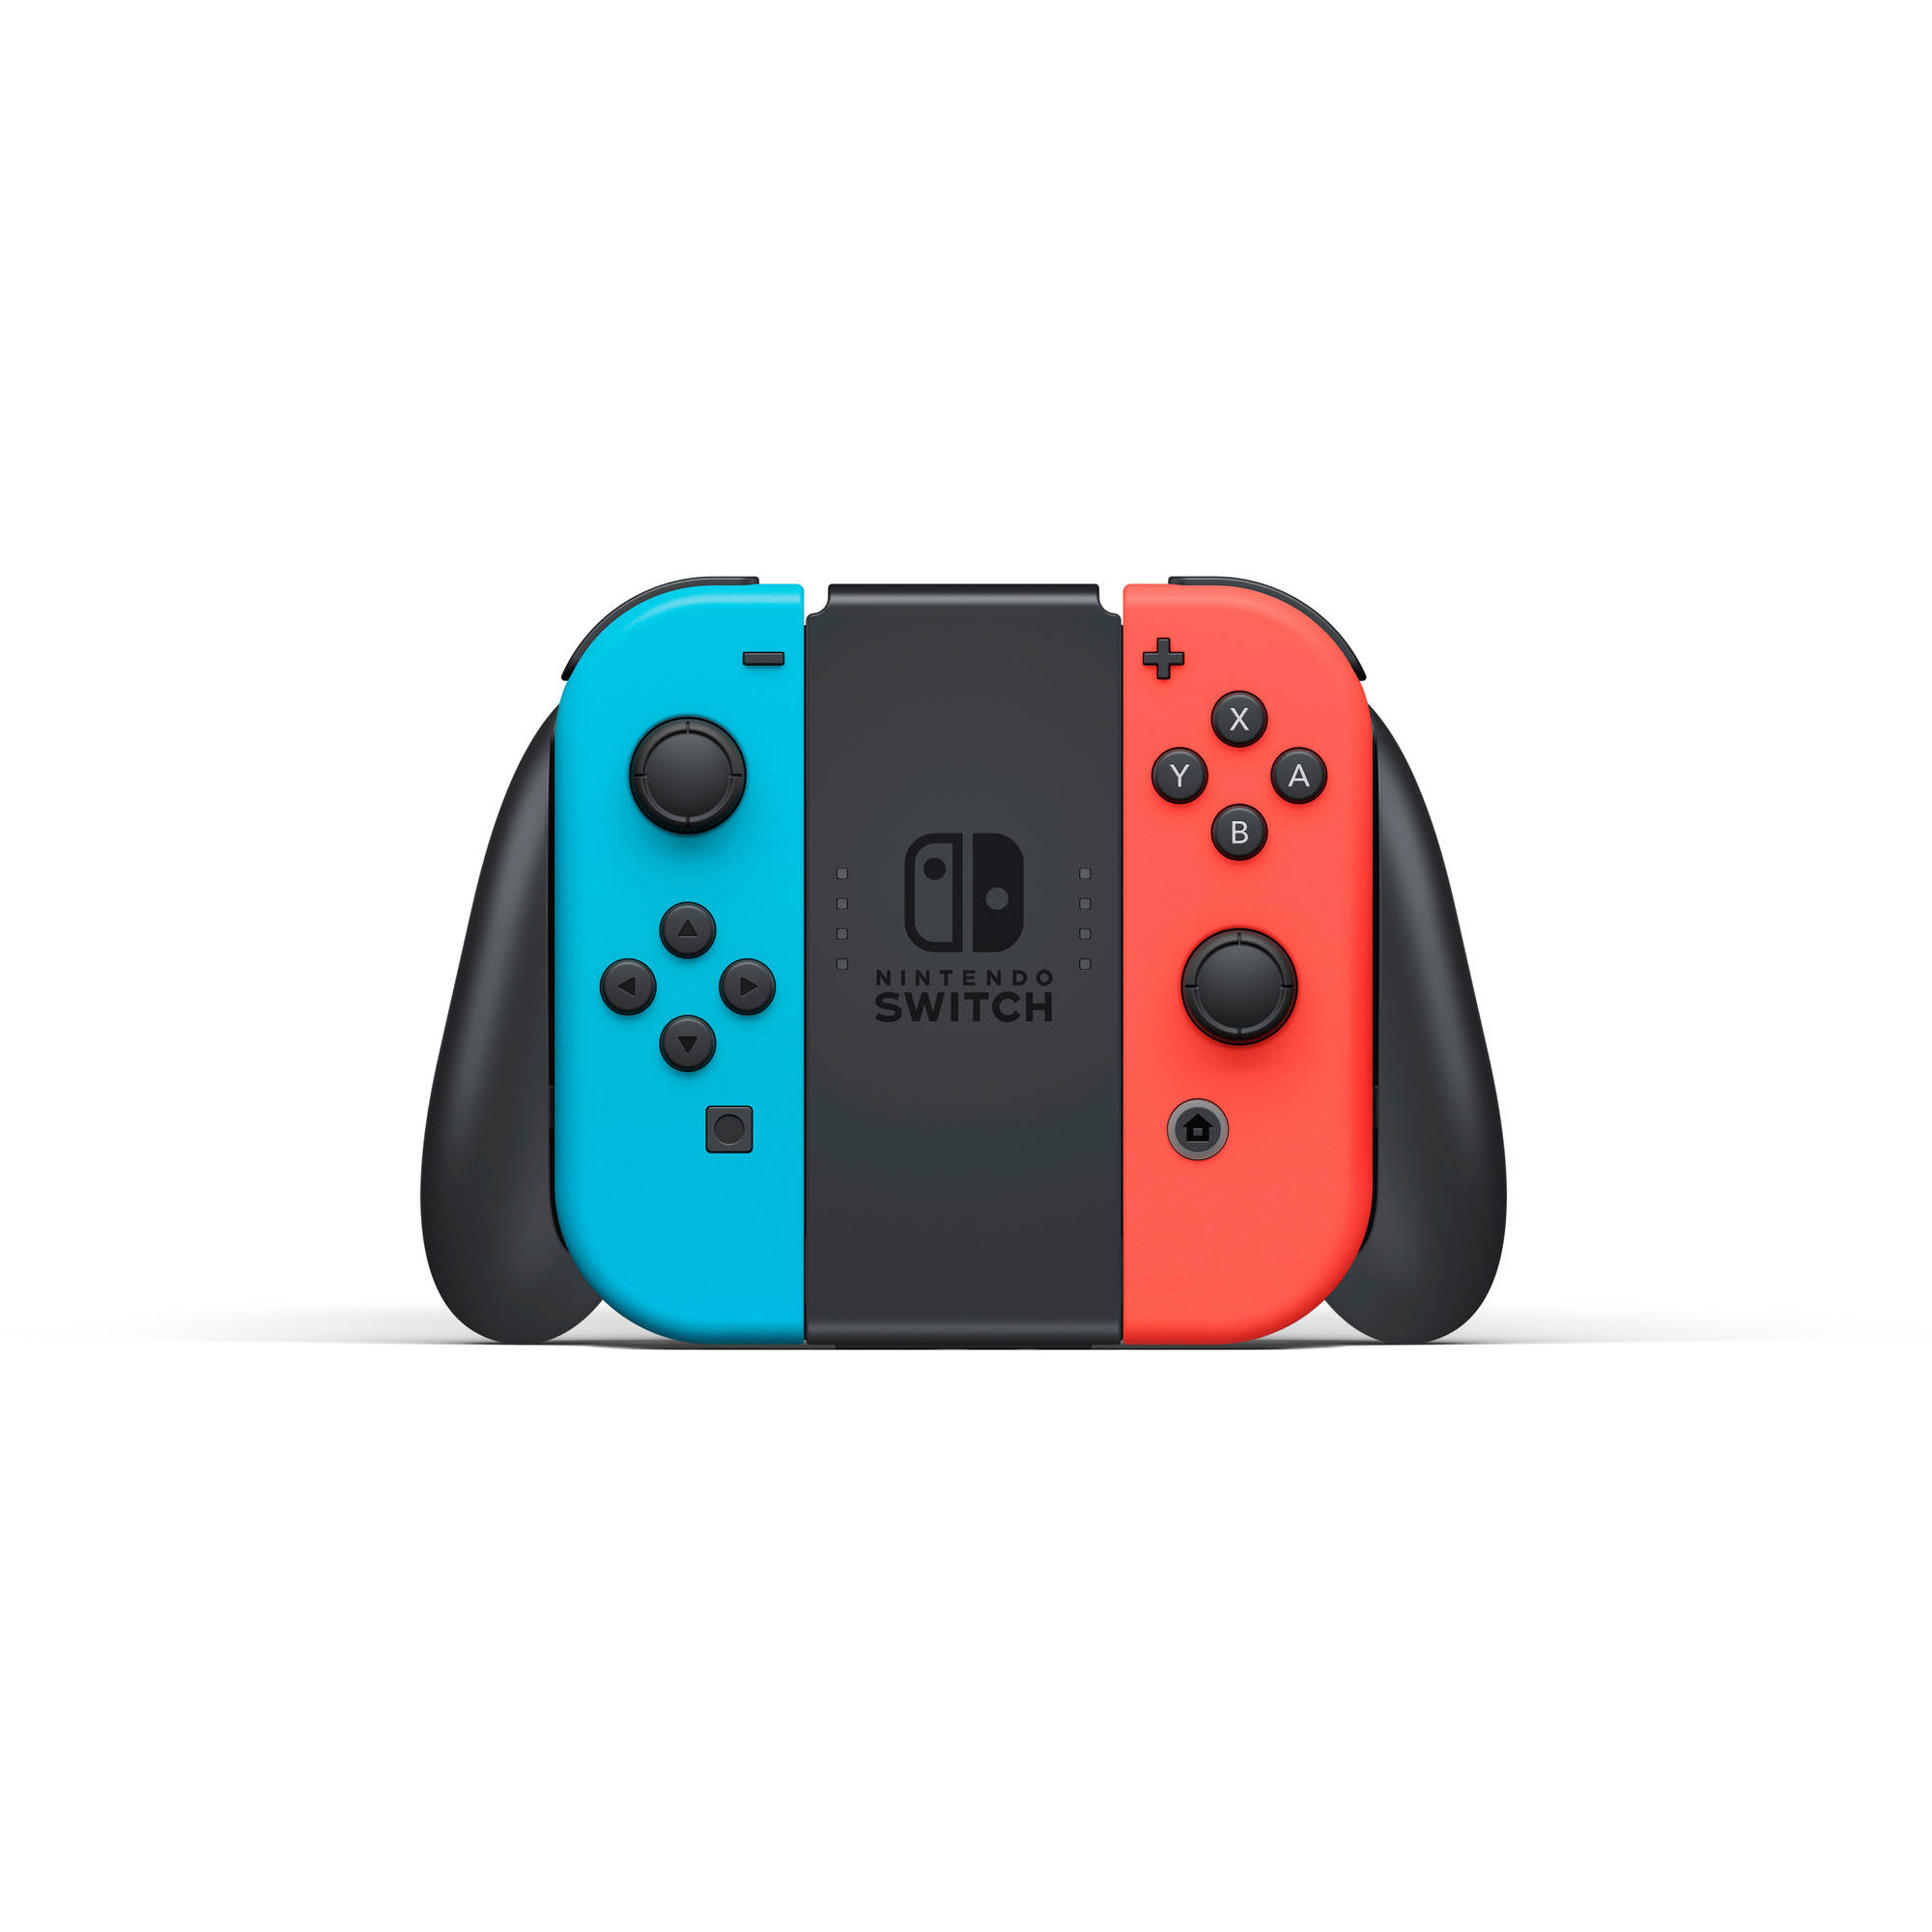 Nintendo Switch Console With Neon Blue Red Joy Con Hacskabaa 8 Way Joystick